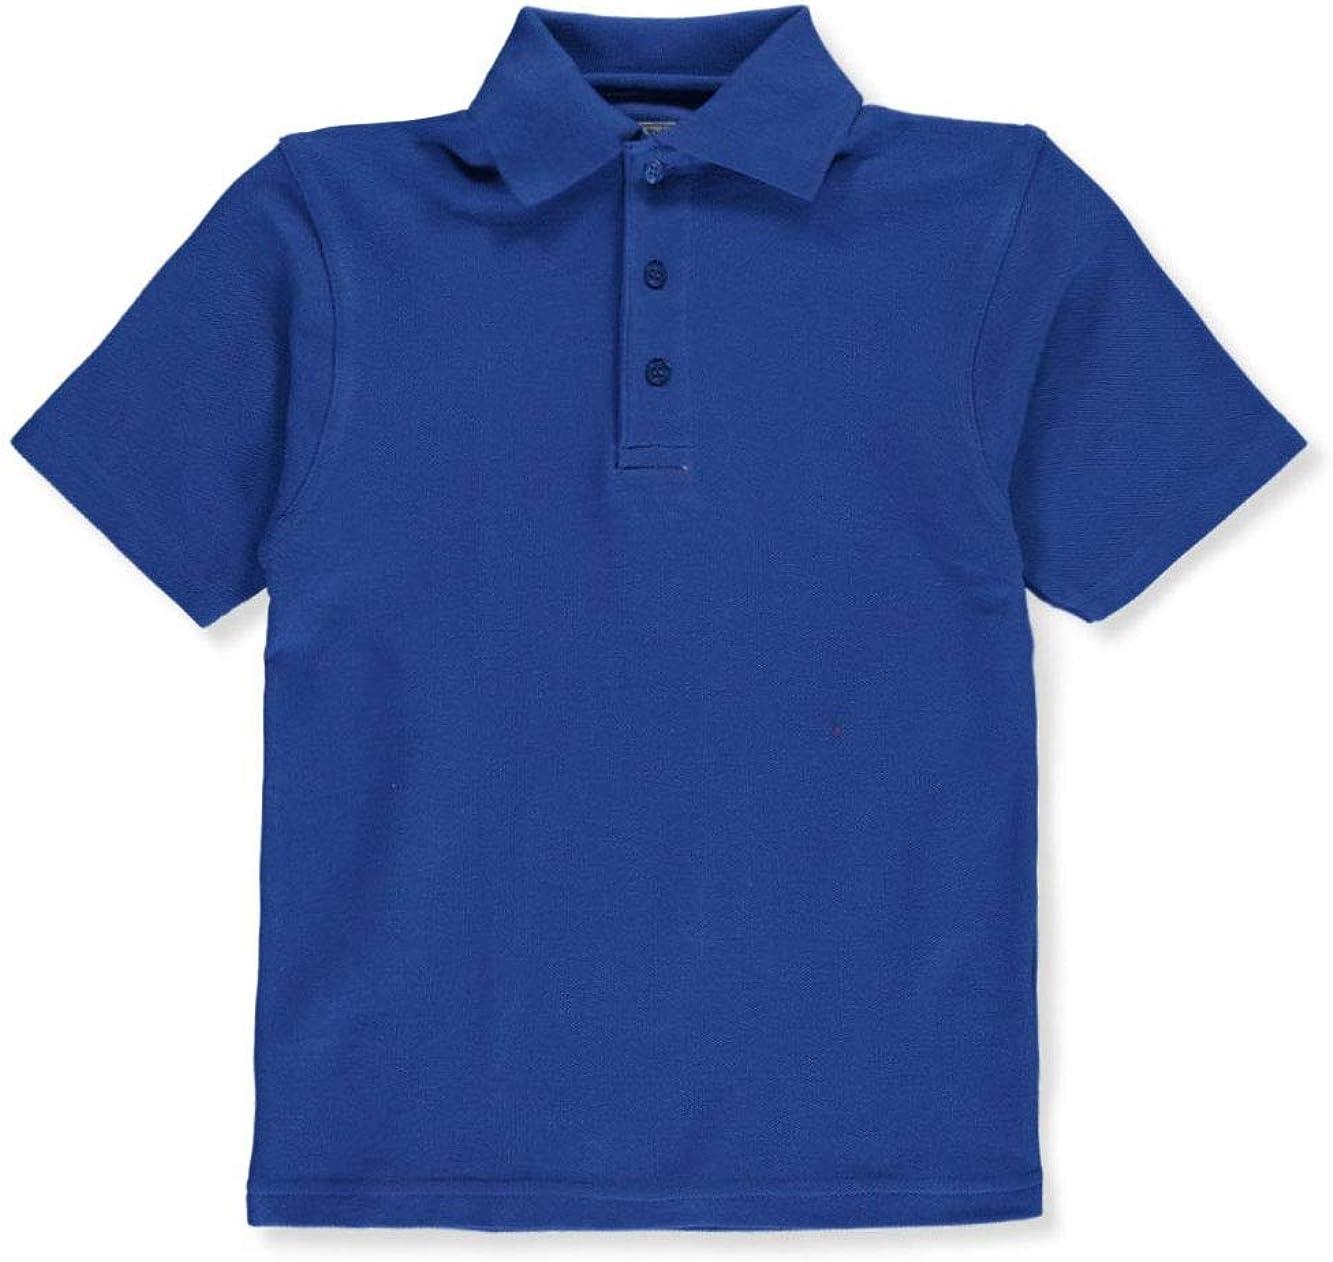 Toddler /& Girls Dockers Uniform Navy Polo Shirts Size 2T 5//6